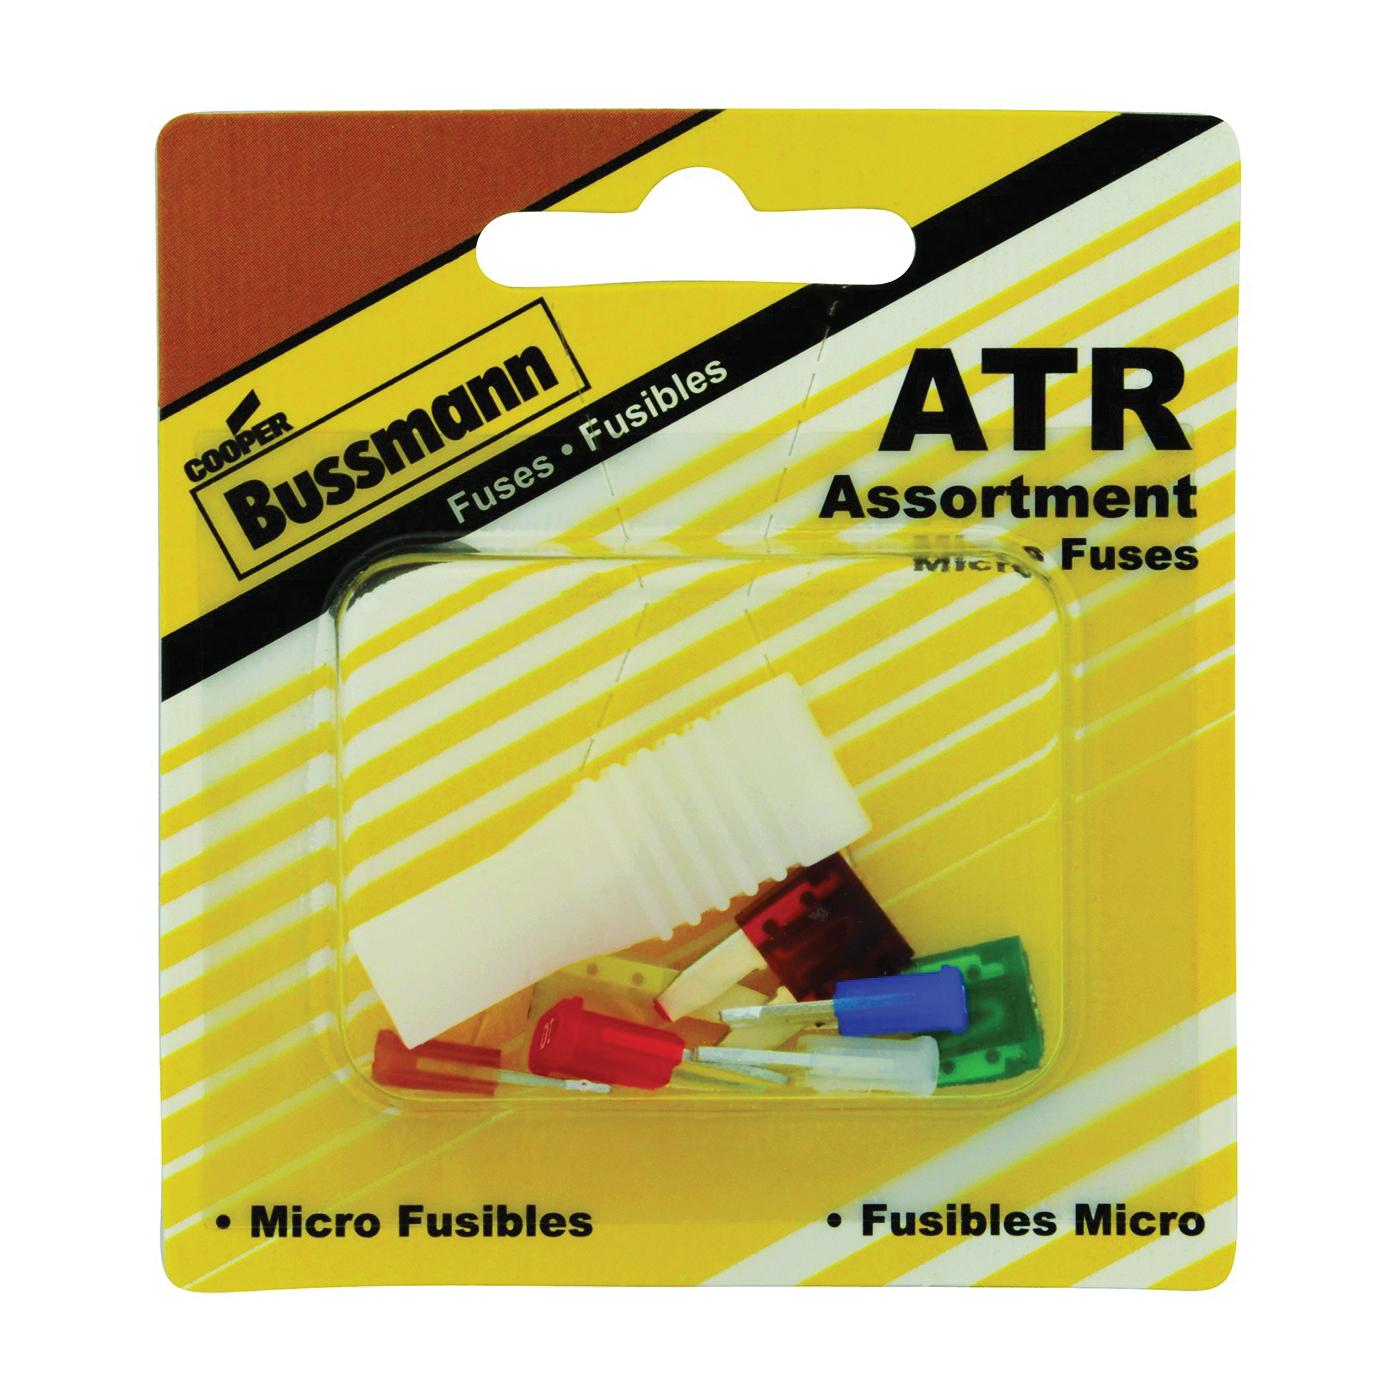 Picture of Bussmann BP/ATR-A7-RPP Fuse Kit